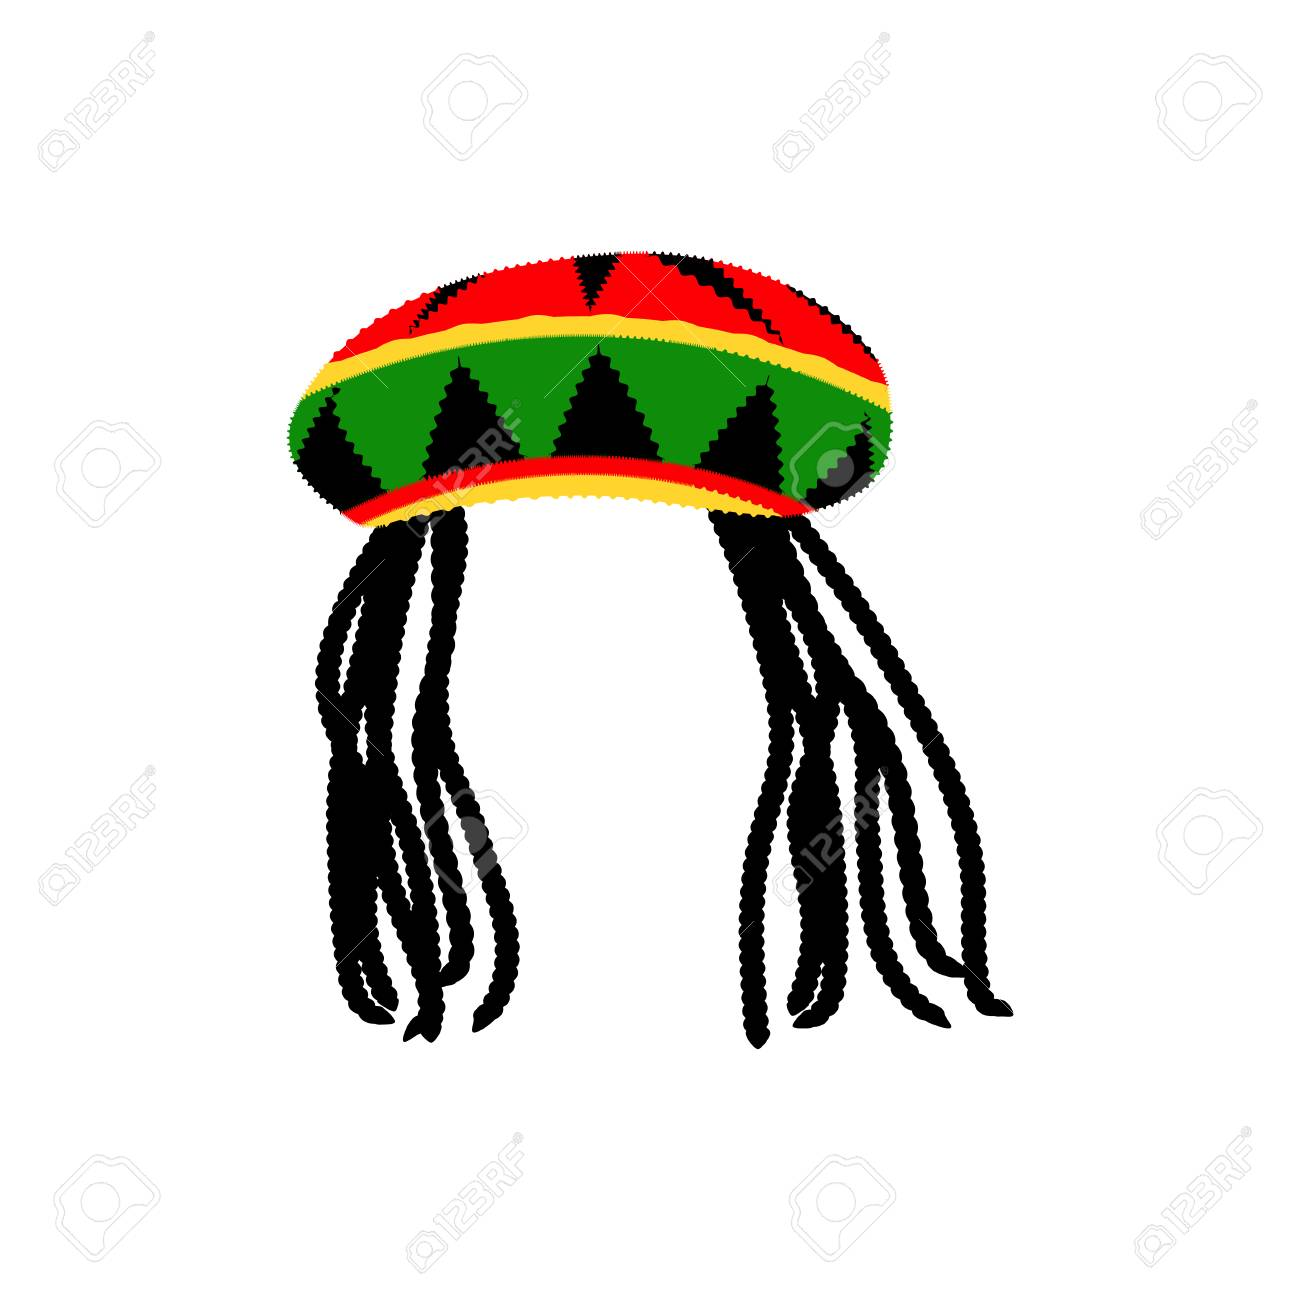 Jamaican rasta hat with dreadlocks. Reggae style avatar. Isolated on white  background. Vector c9c121a89